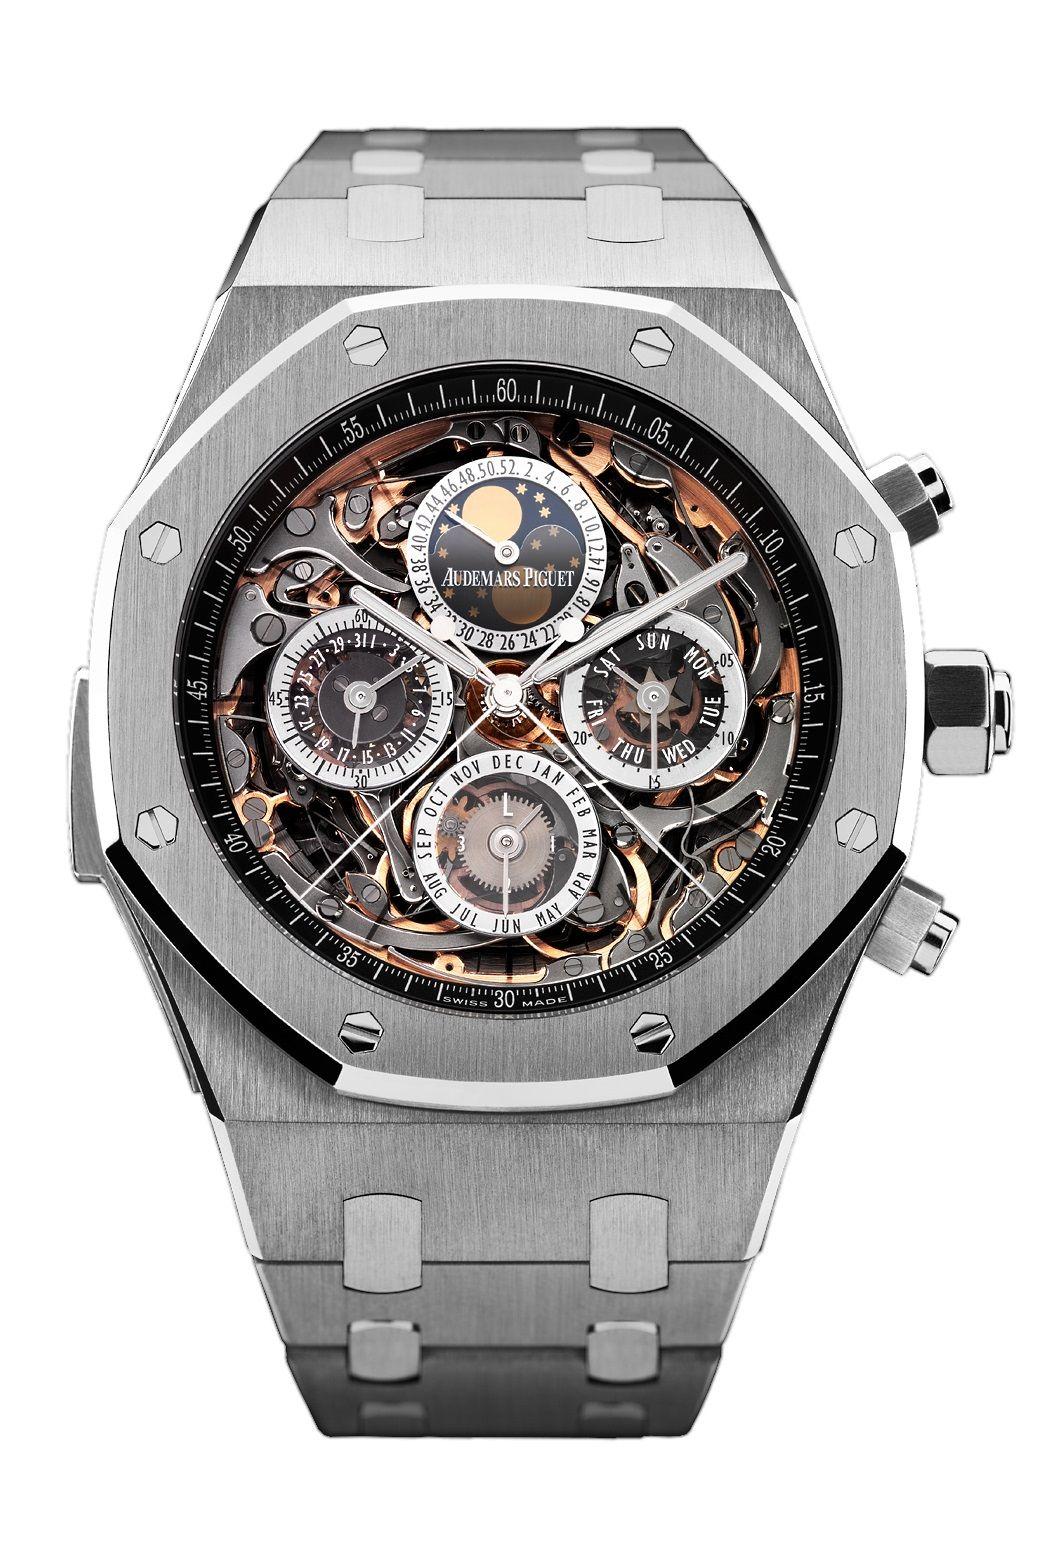 réplica Audemars Piguet Royal Oak OpenWorked Grande Complication reloj 26065IS.OO.1105IS.01